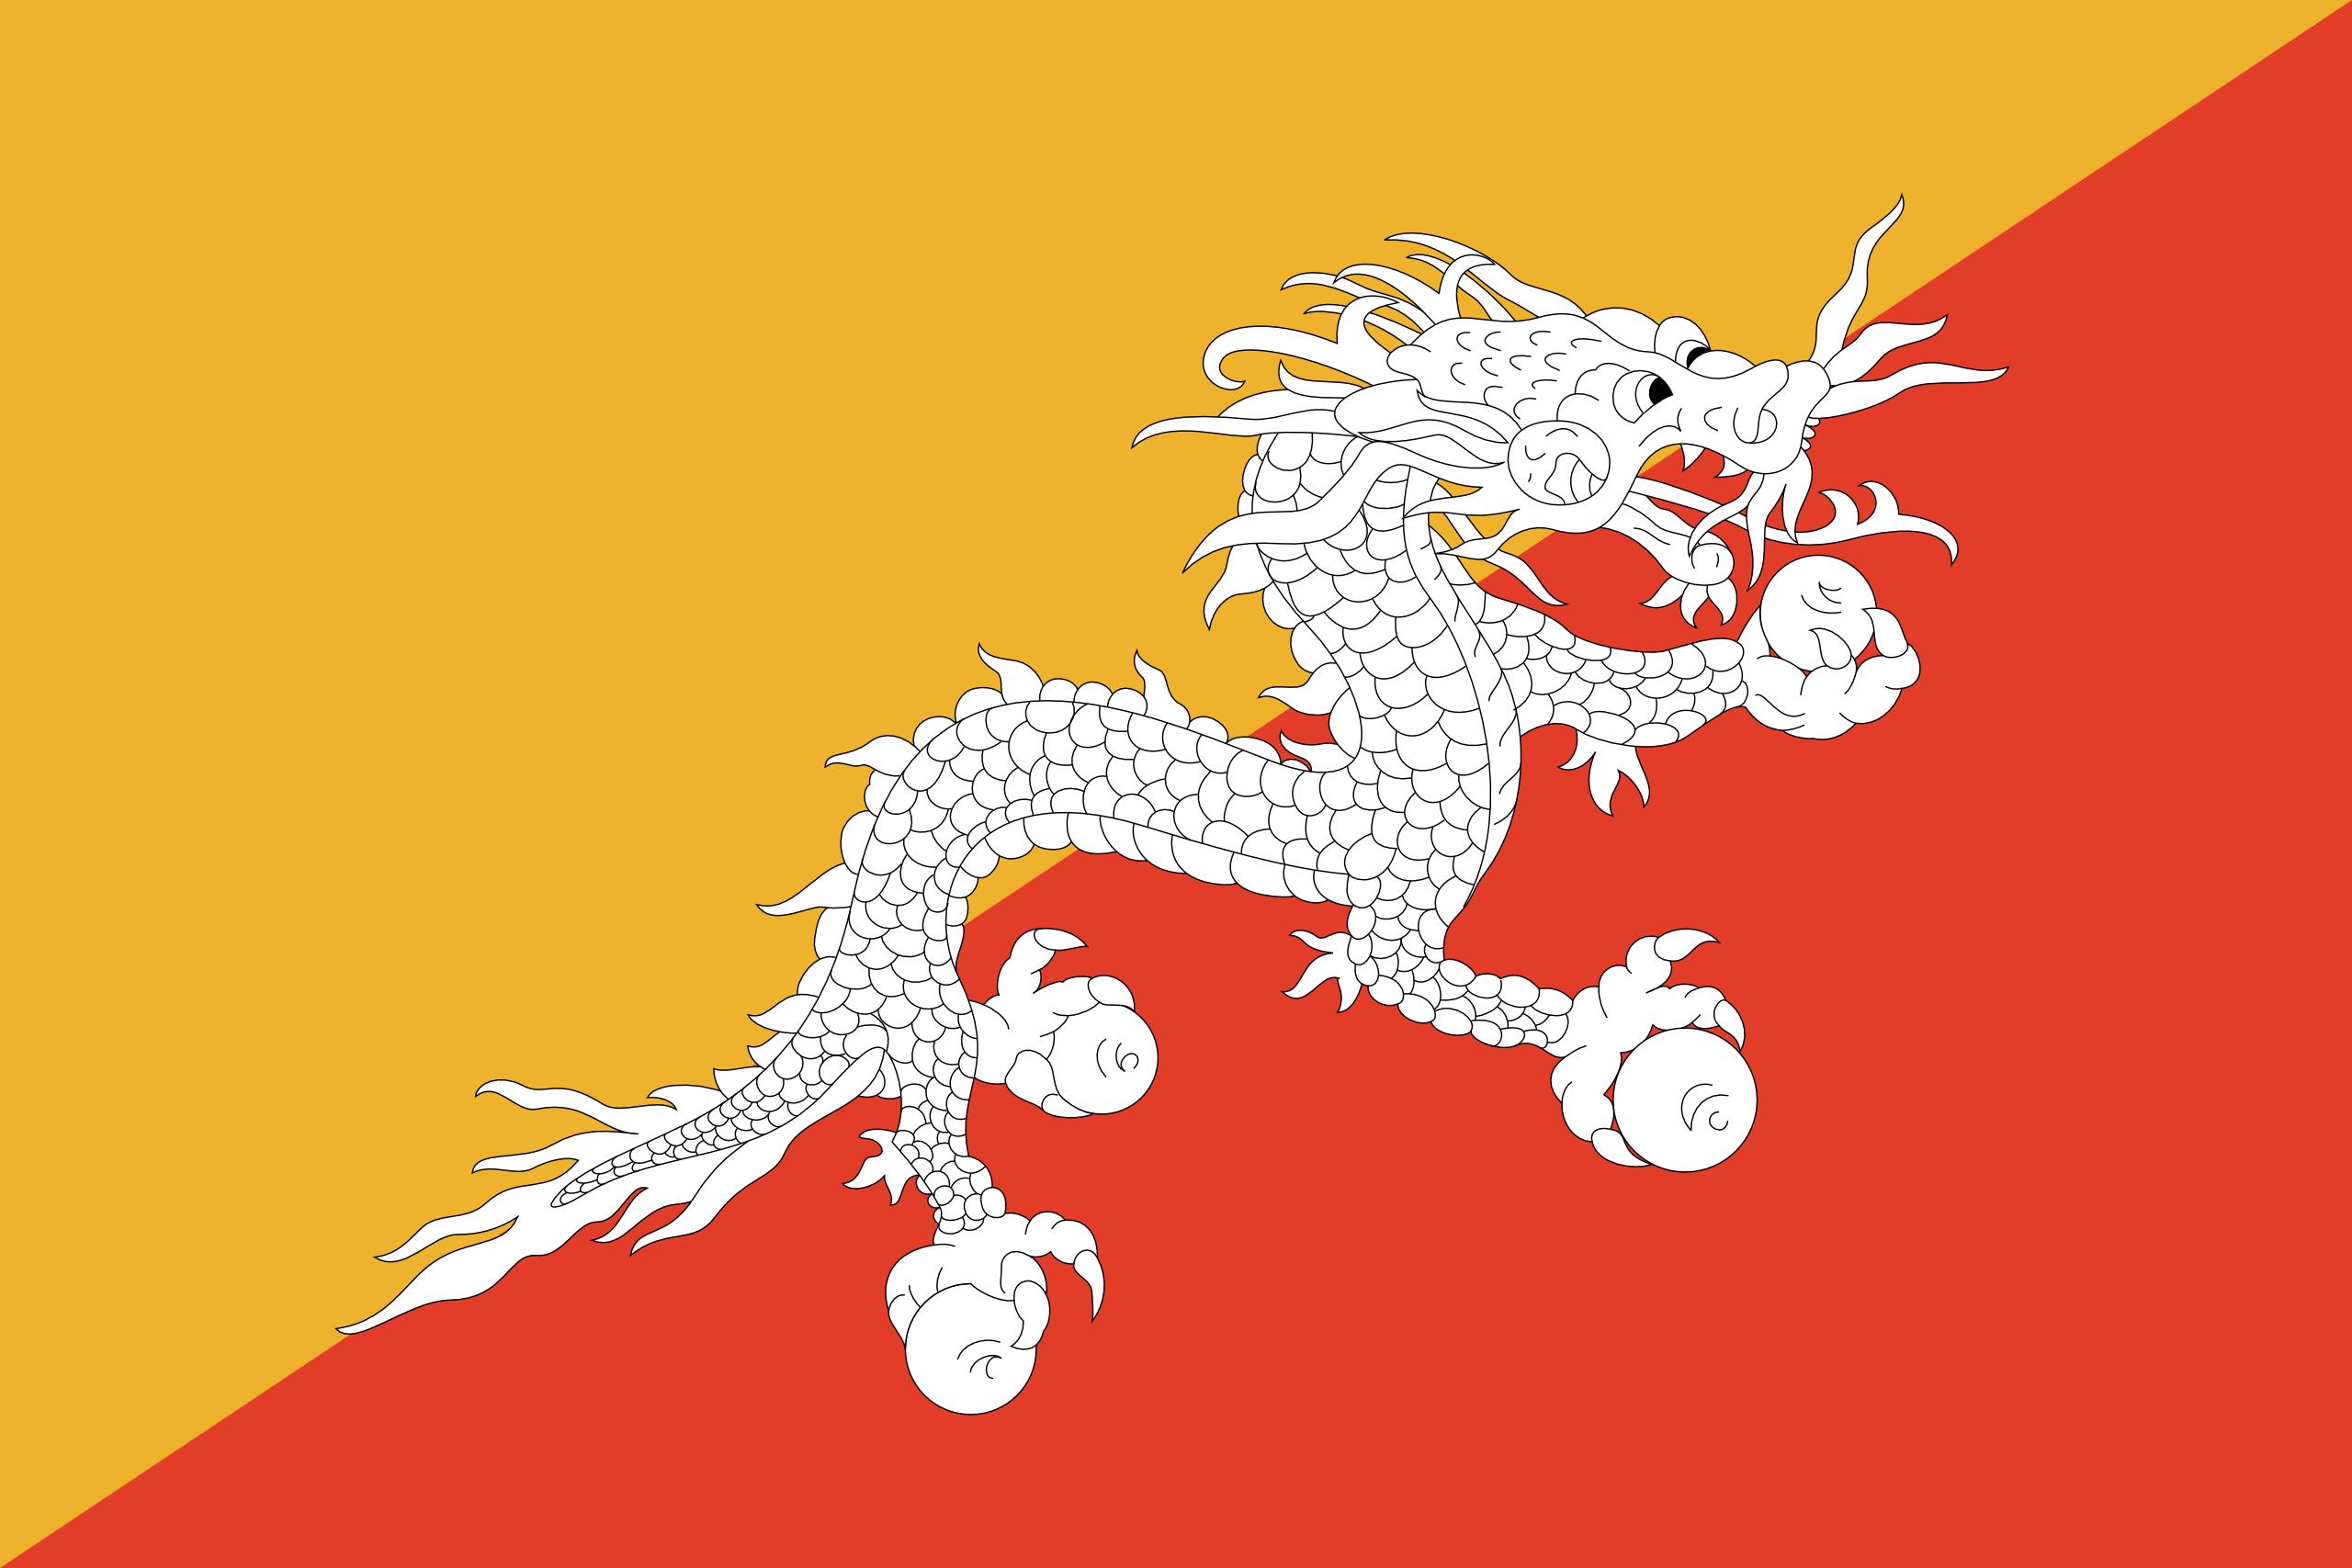 bután, país, emblema, insignia, प्रतीक - HD वॉलपेपर - प्रोफेसर-falken.com